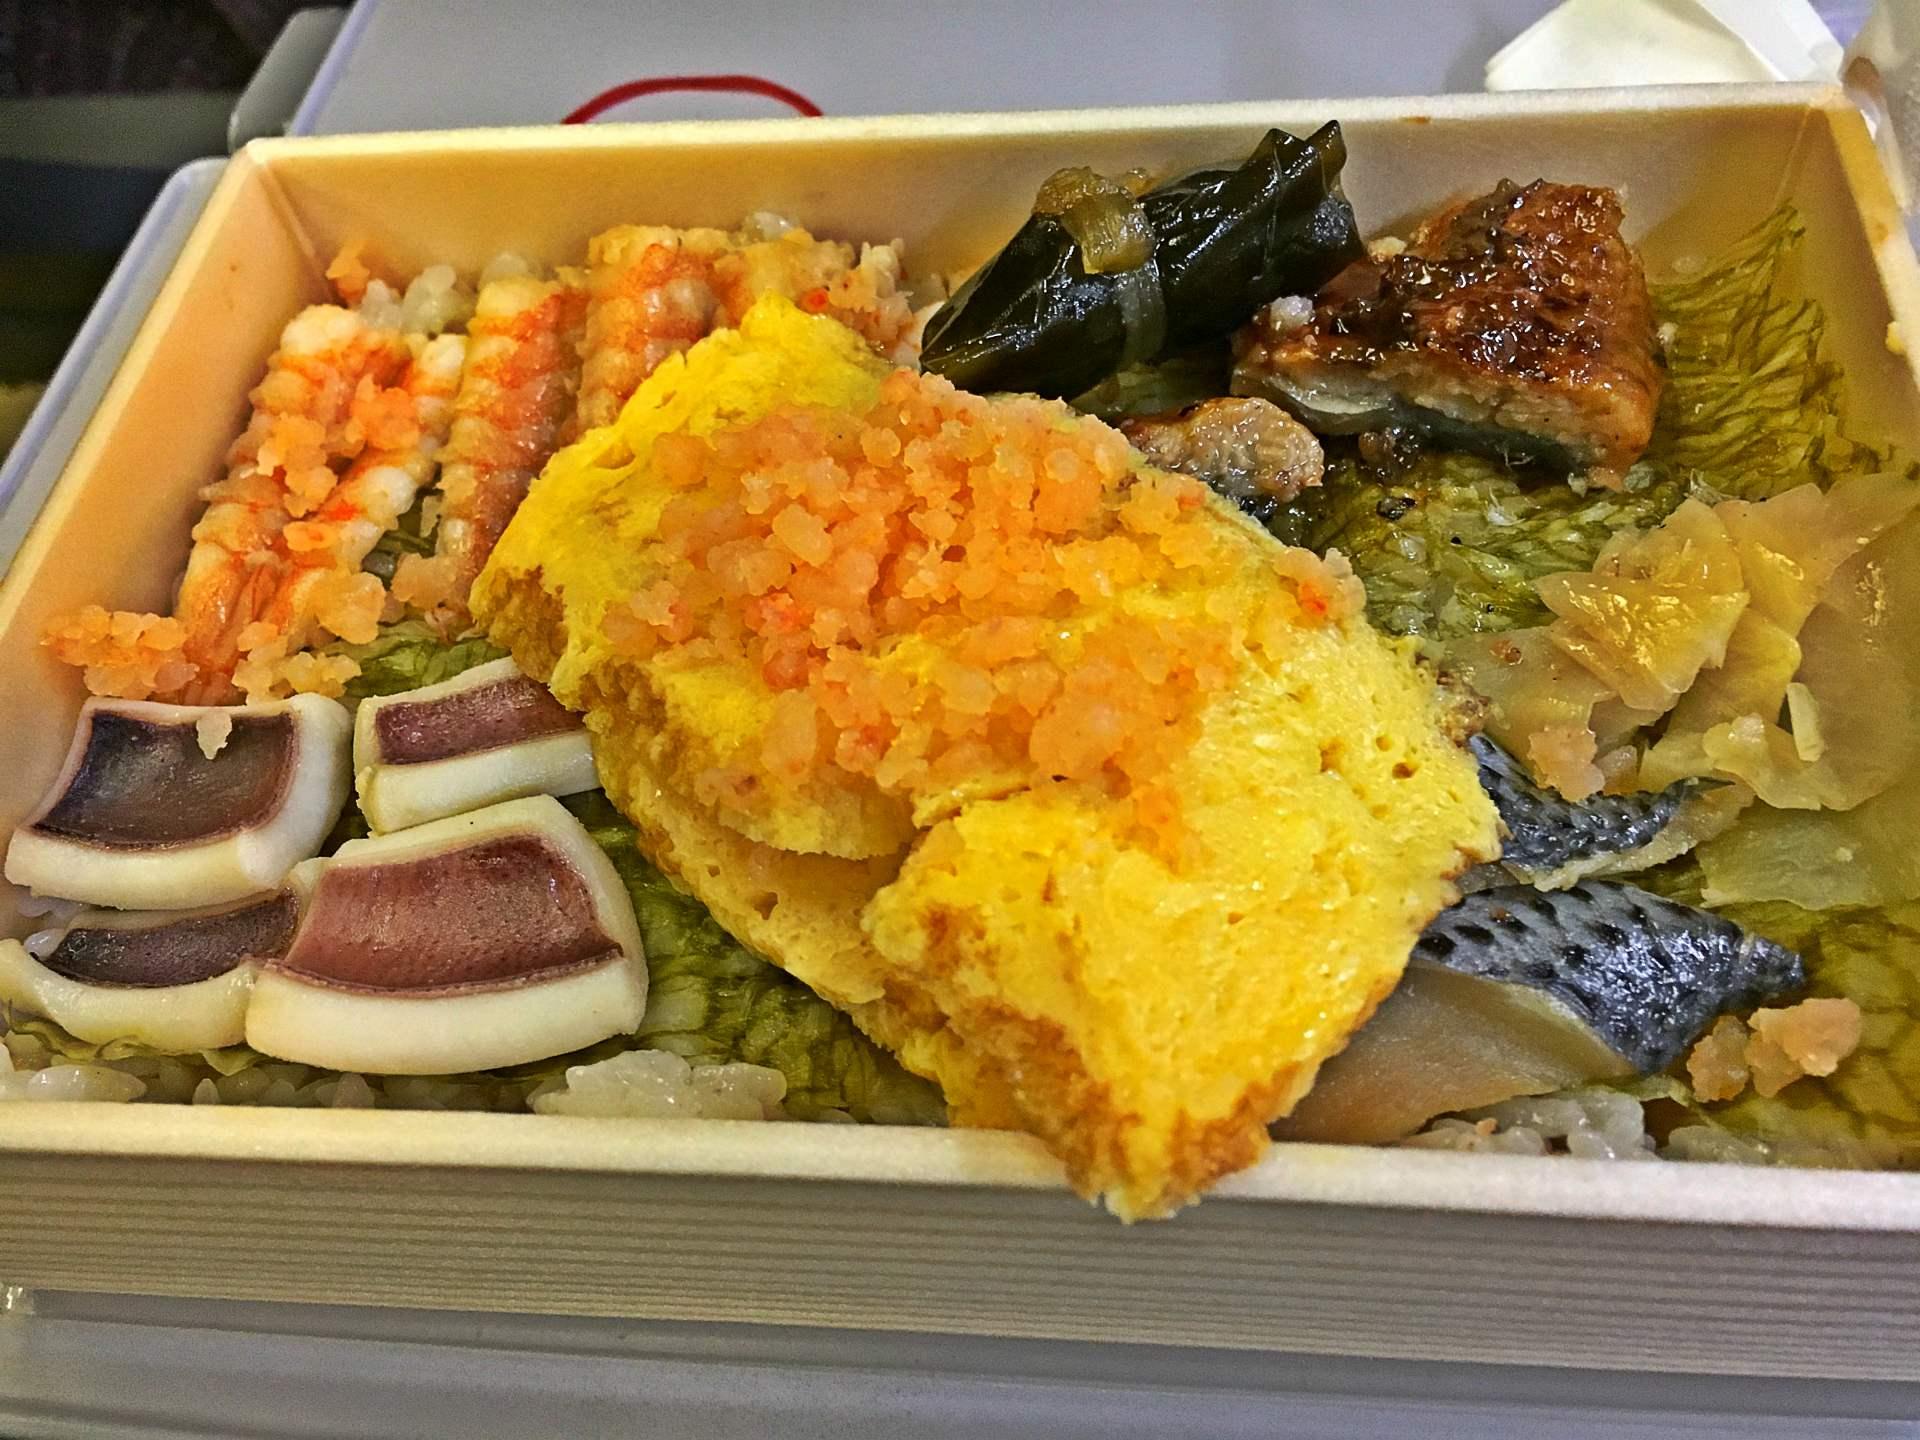 Appetizing railway boxed mea